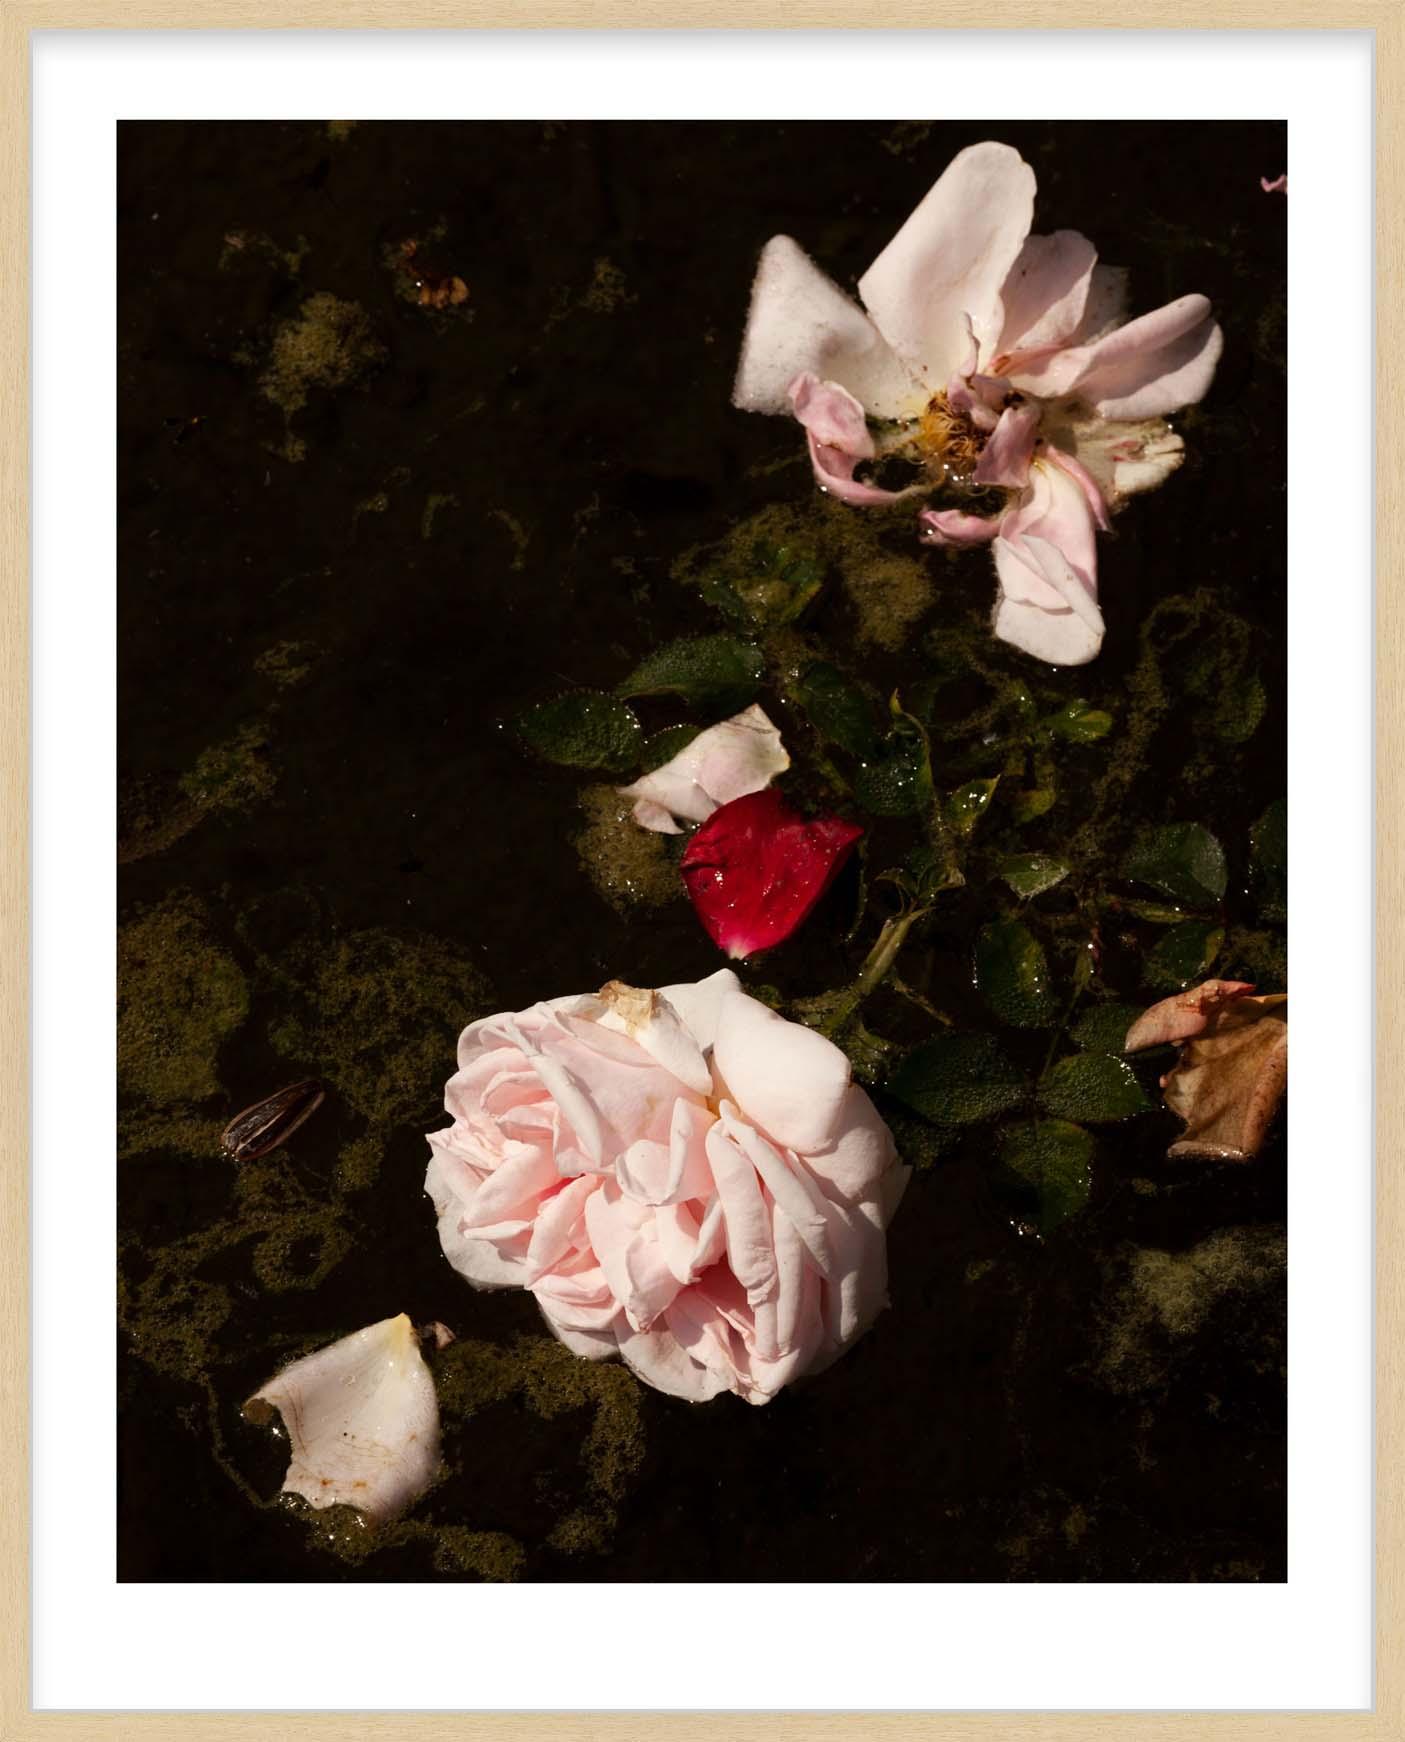 Hang Tough 'Roses, Sludge' Slip Mounted in Raw Ayous (Framing Only)